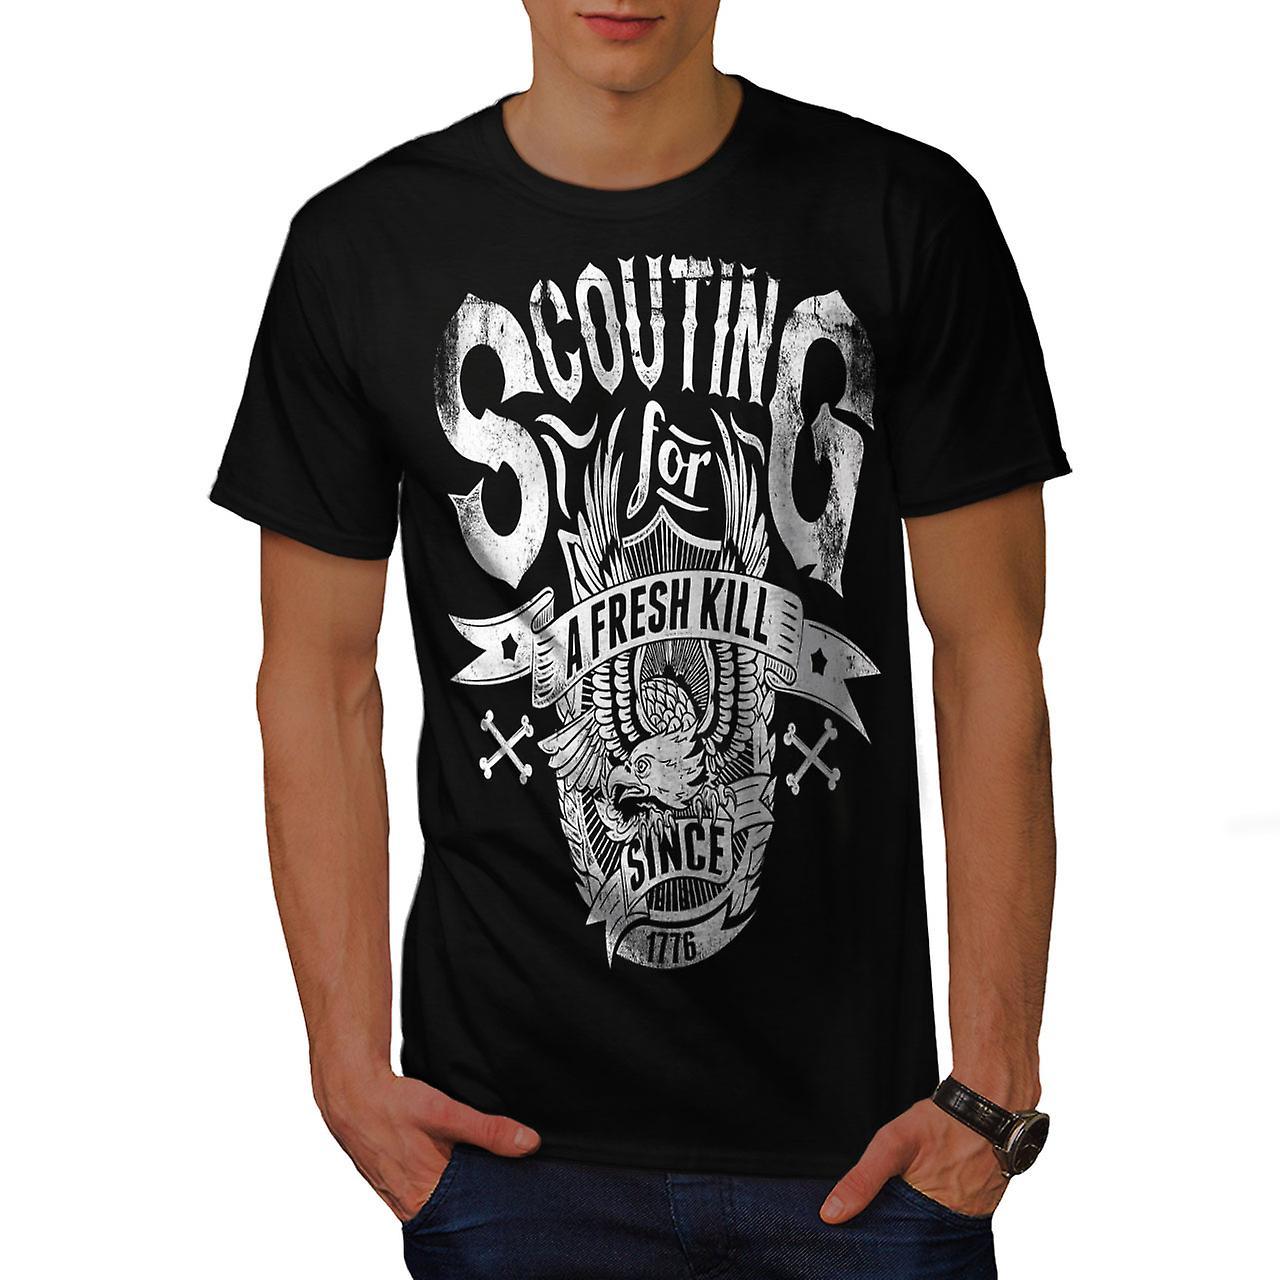 Scouting For Kill Vintage Men Black T-shirt   Wellcoda